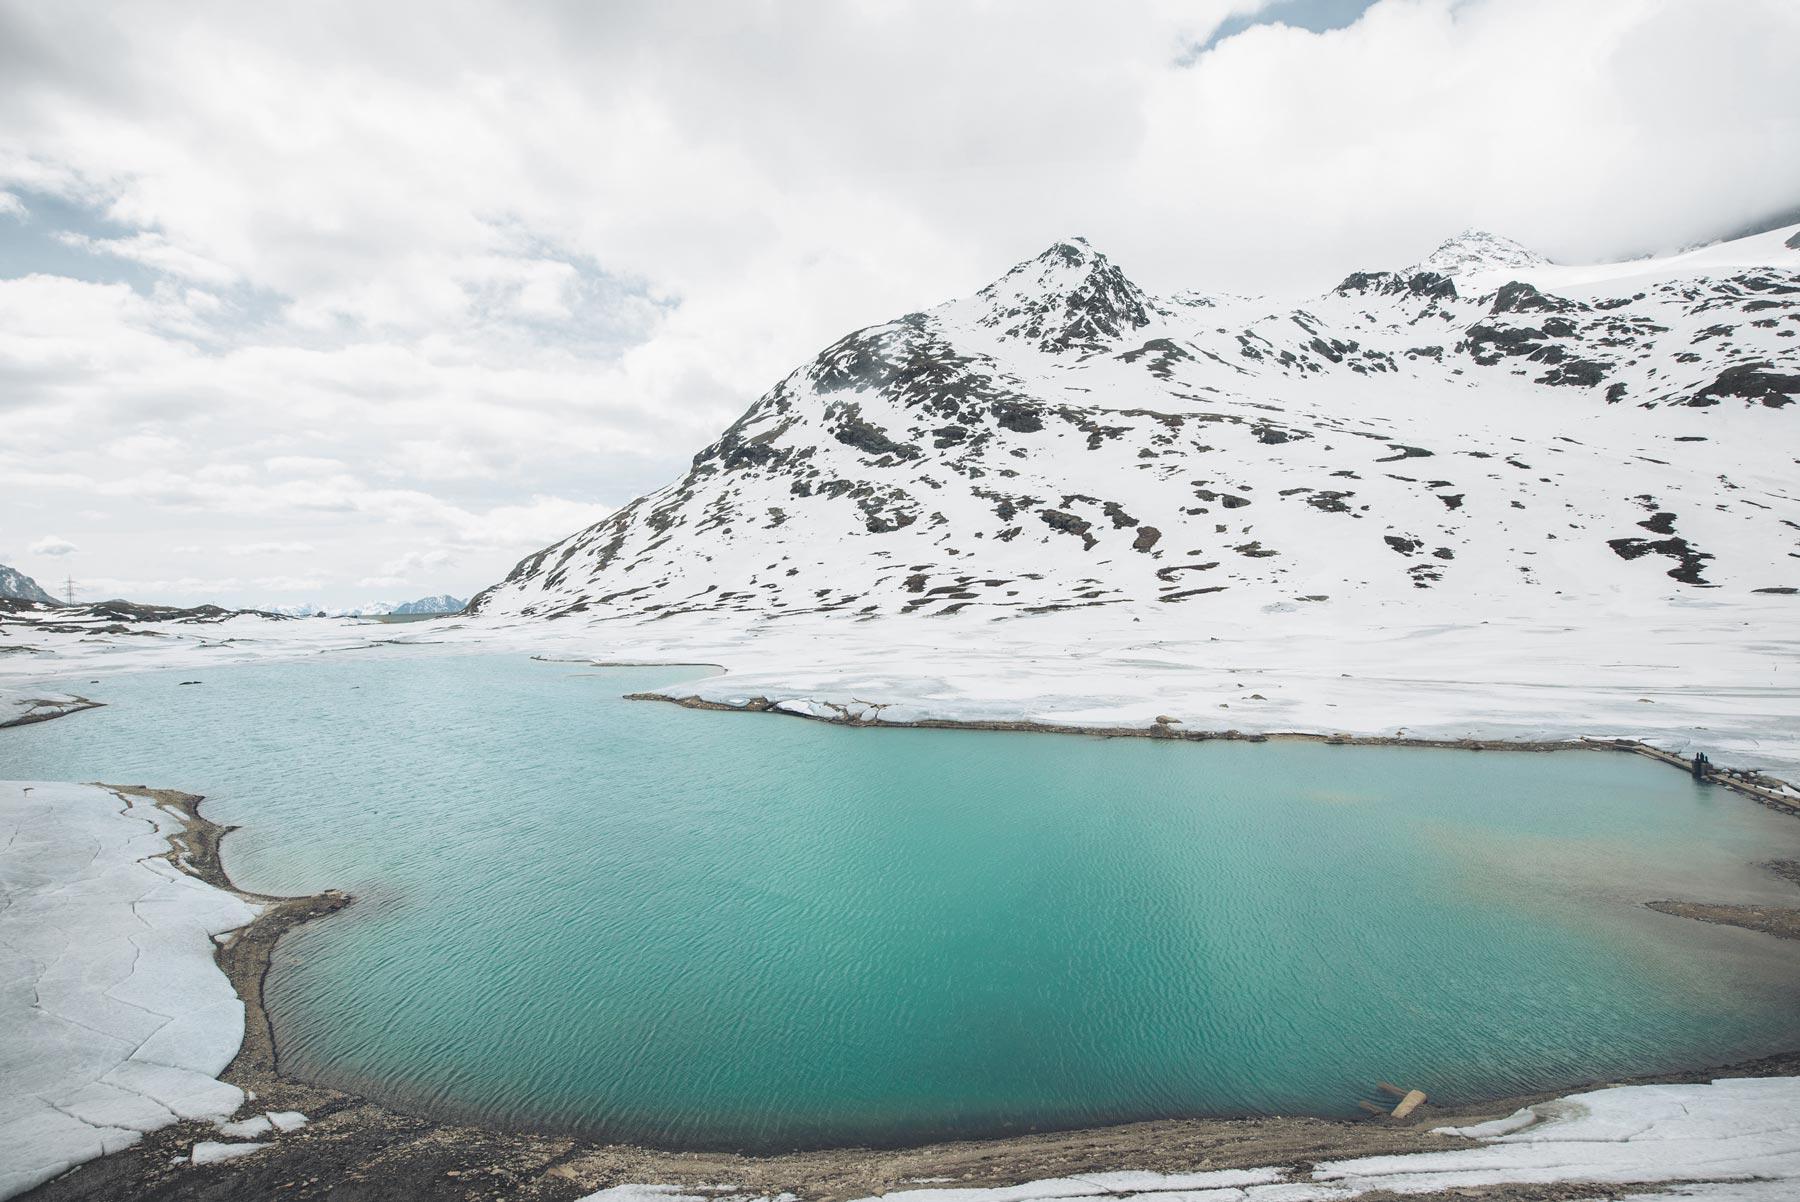 Lago Bianco, Bernina Express, Suisse